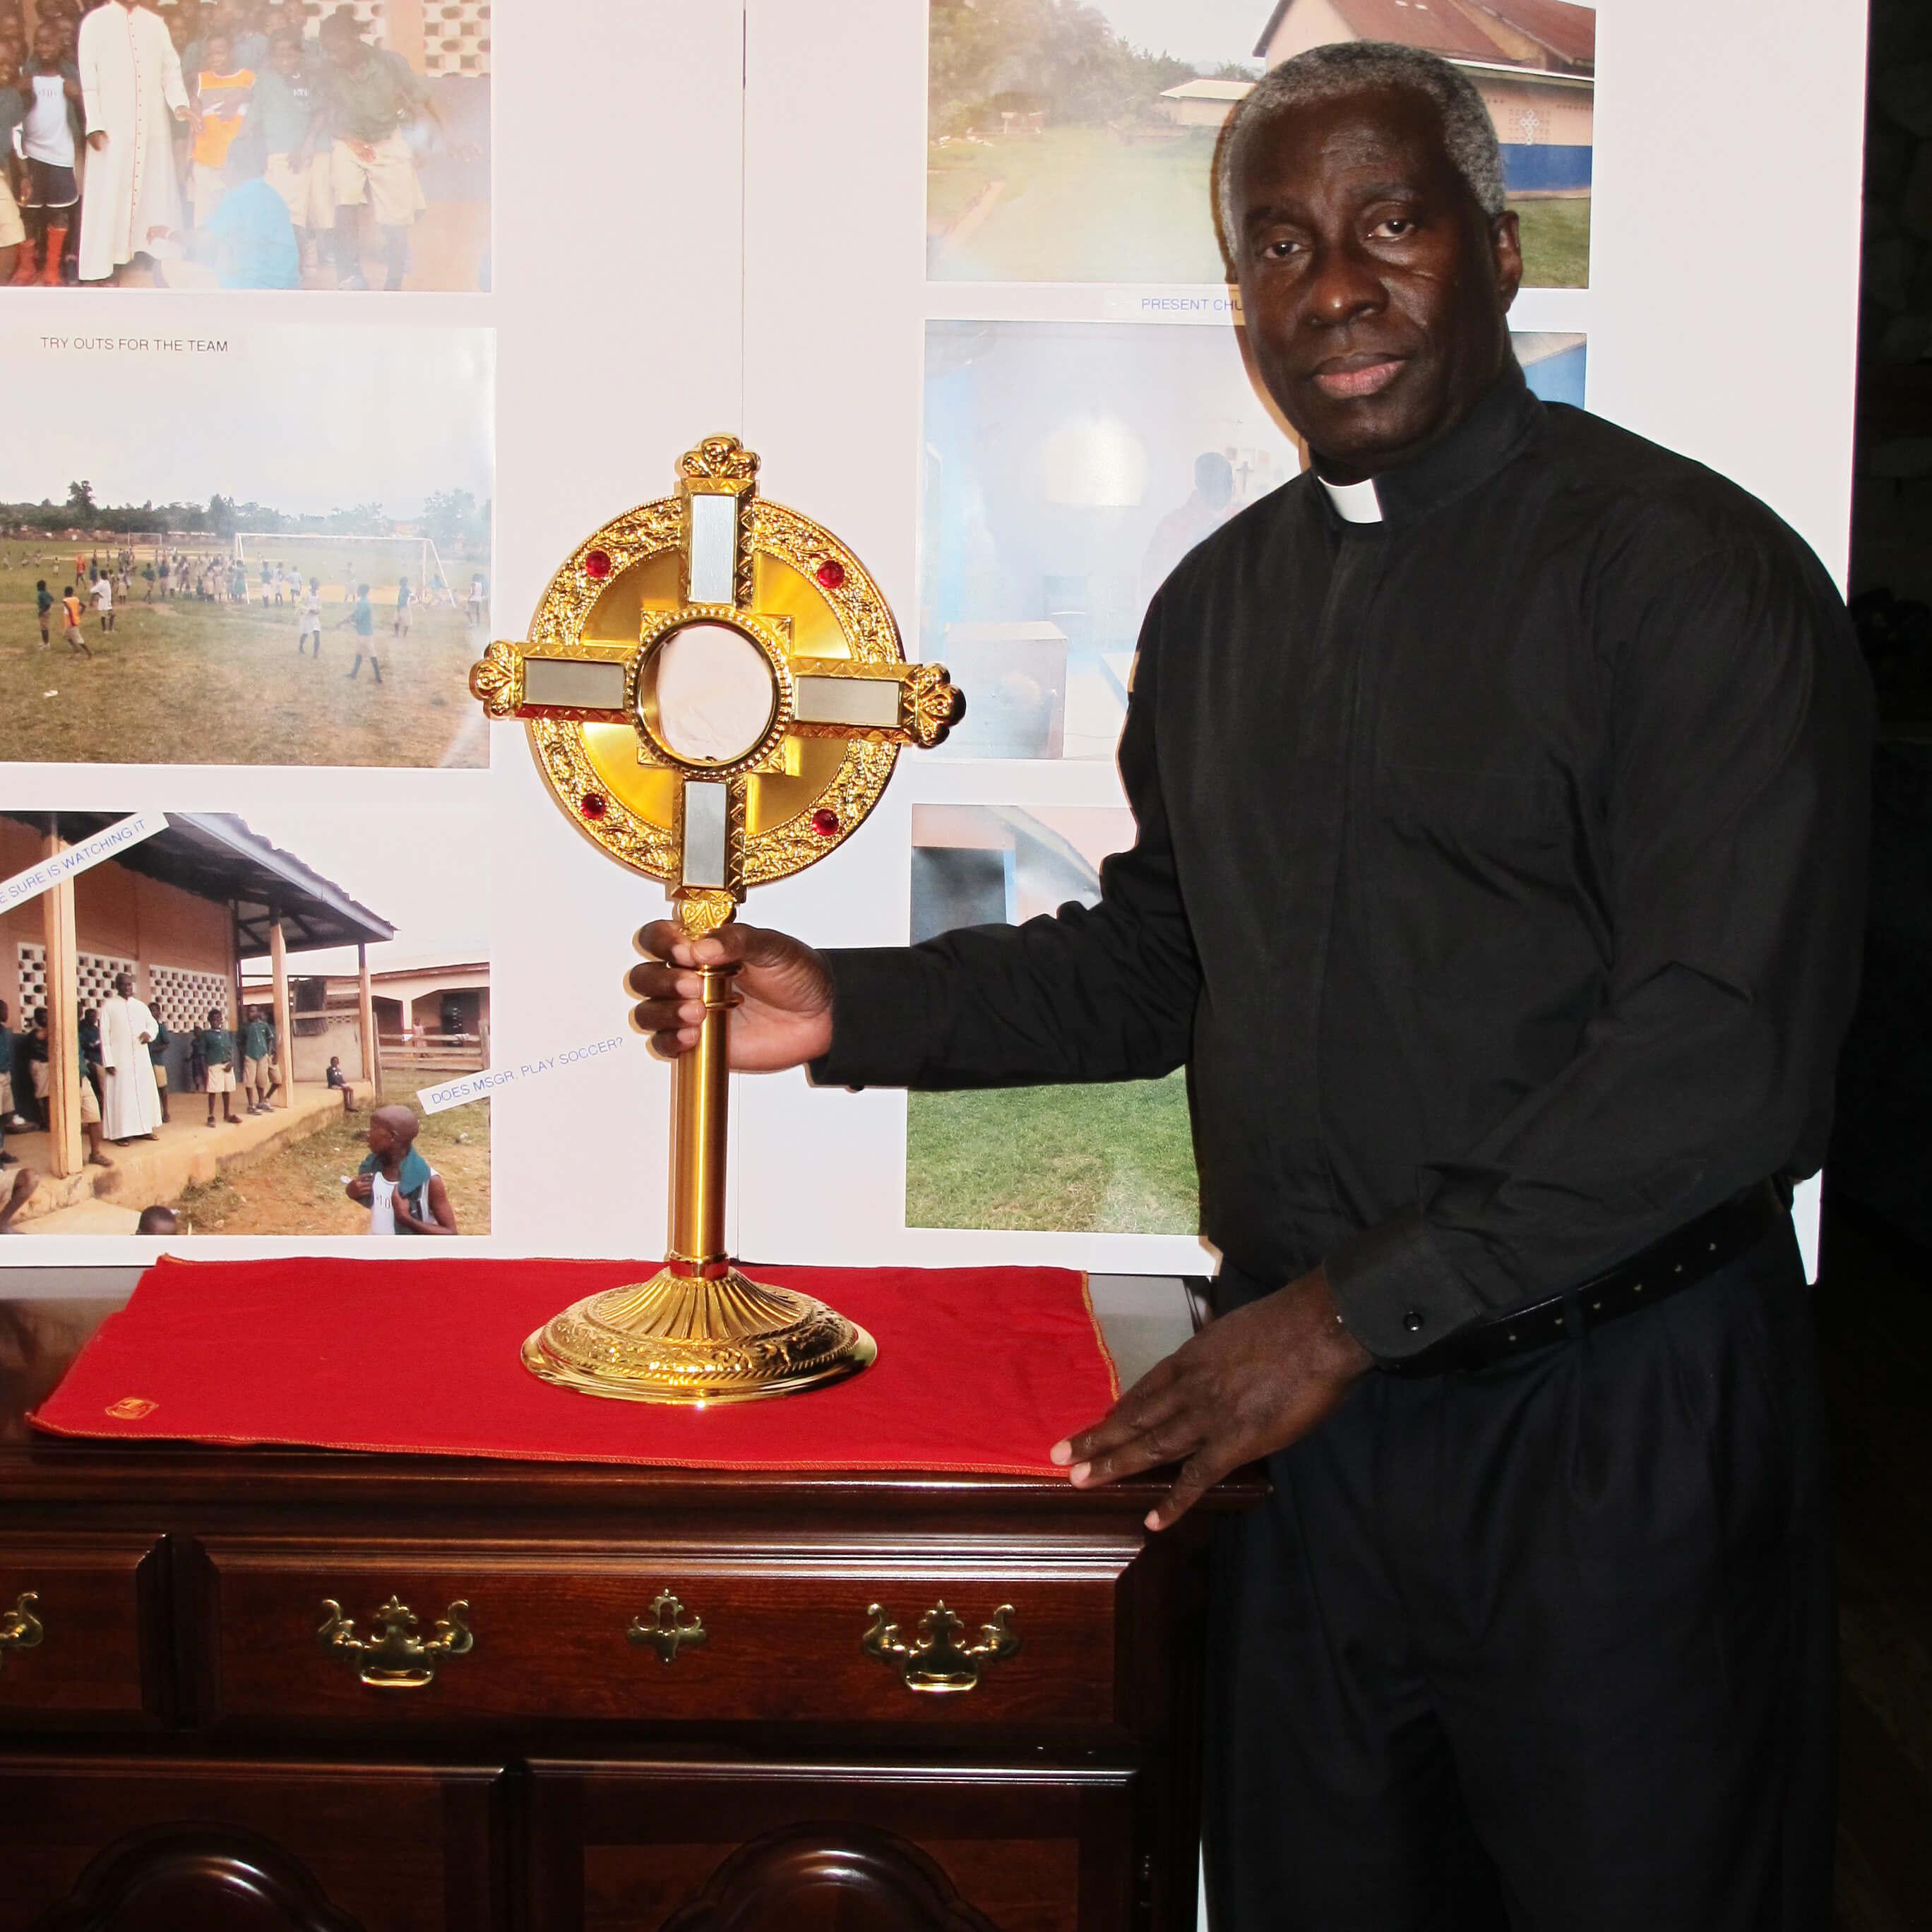 Monsignor Simon, of Ghana, receives a monstrance while visiting Atlanta